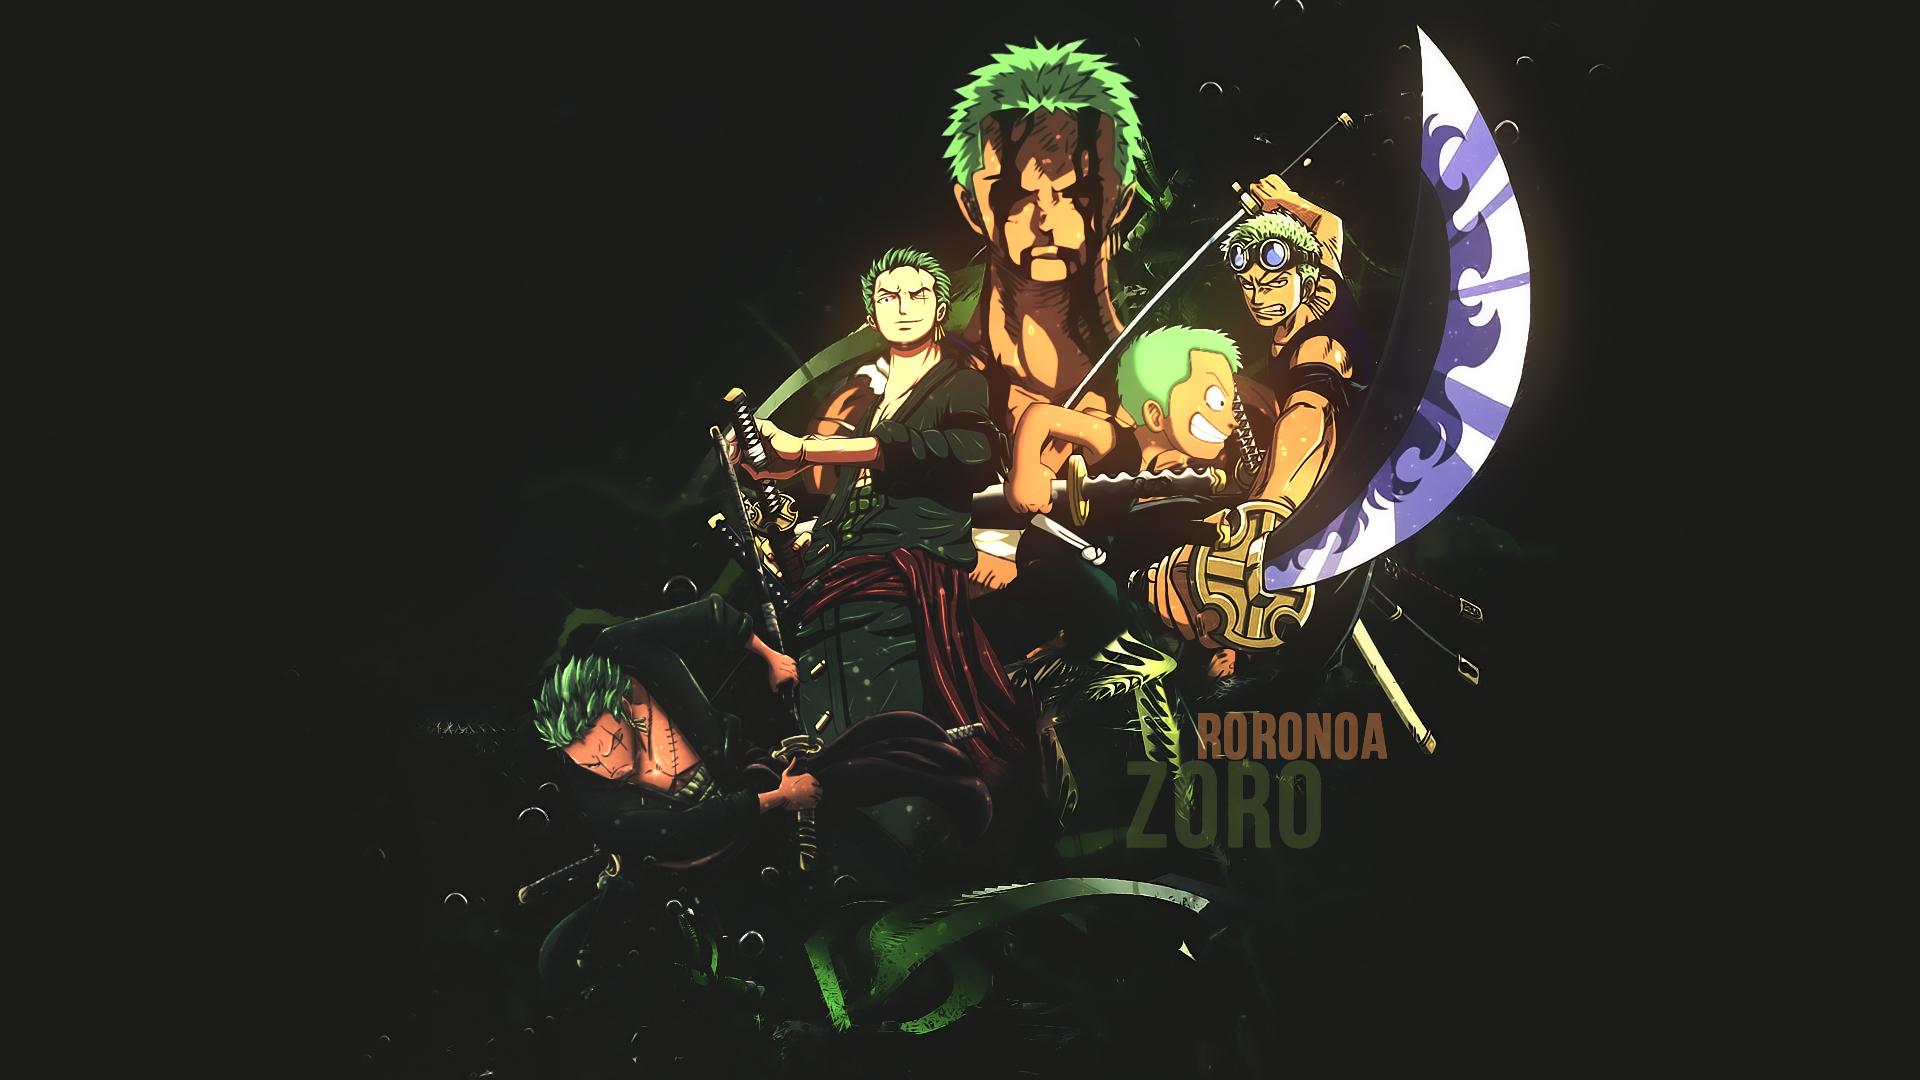 Zoro Fan Needs Help Onepiece